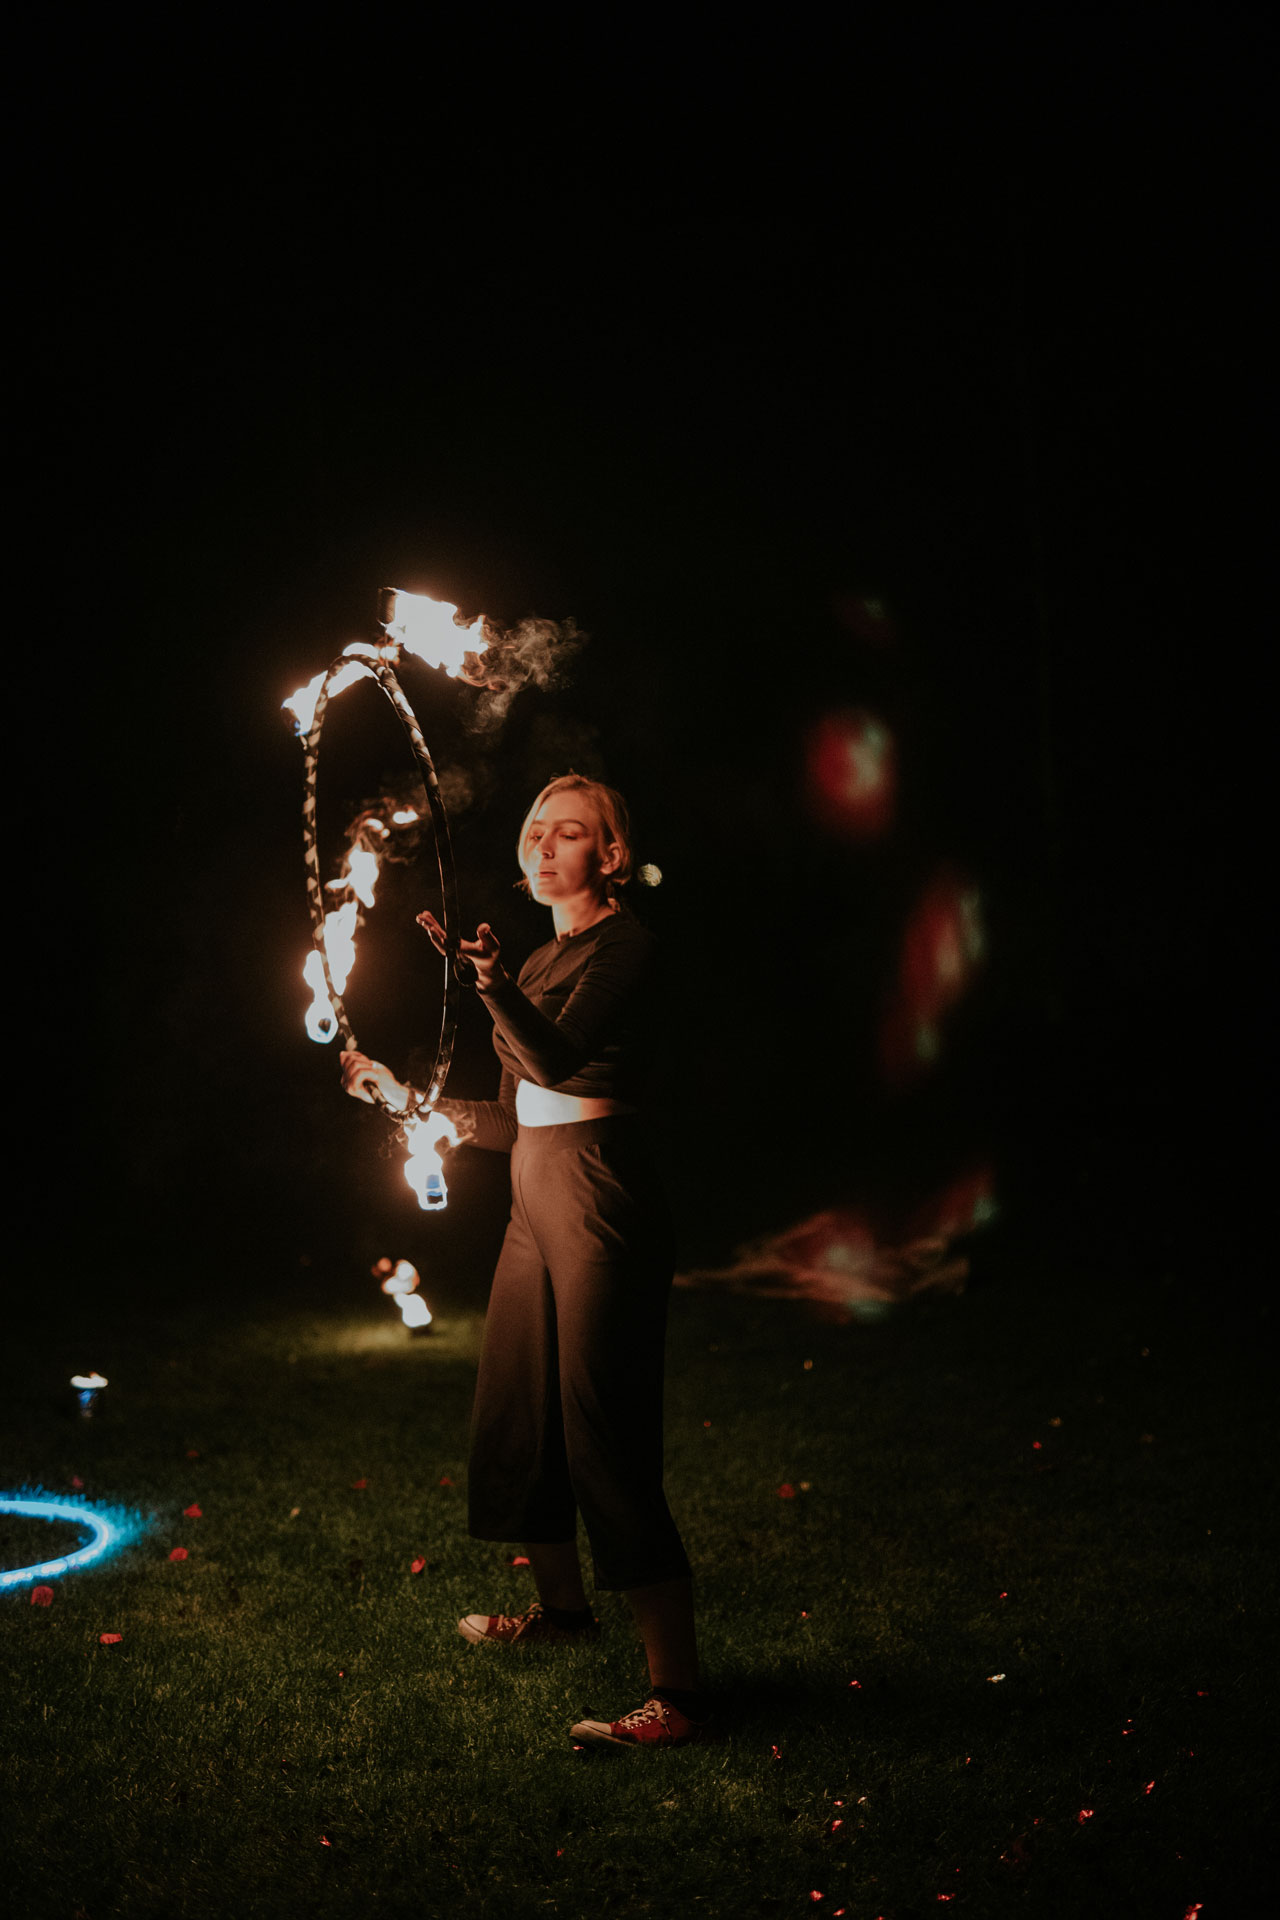 tancerka ognia z hula hoop